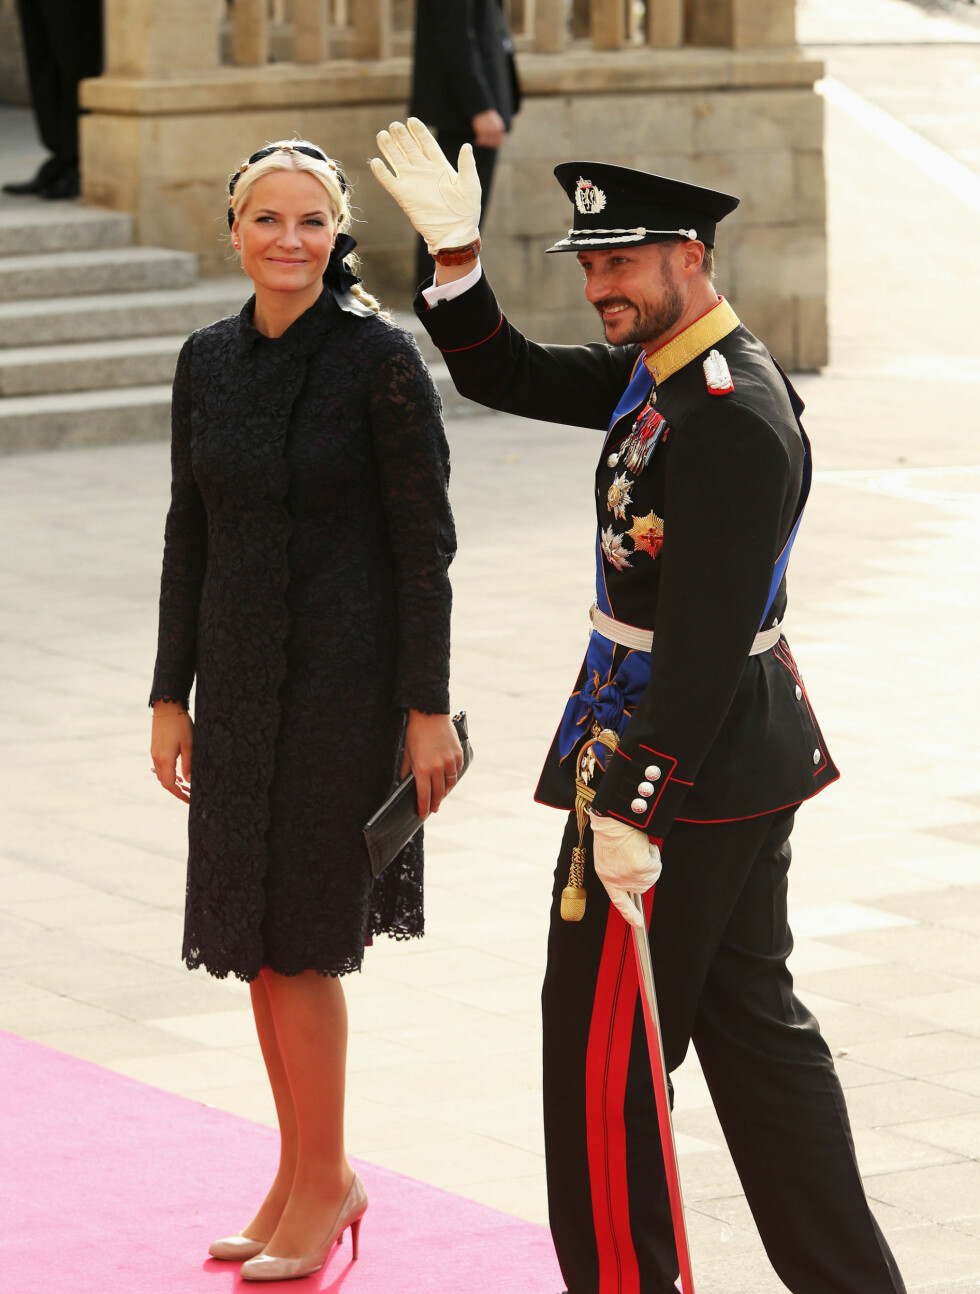 VINKET TIL PUBLIKUM: Kronprins Haakon og kronprinsesse Mette-Marit smilte og vinket til de fremmøtte. Foto: All Over Press